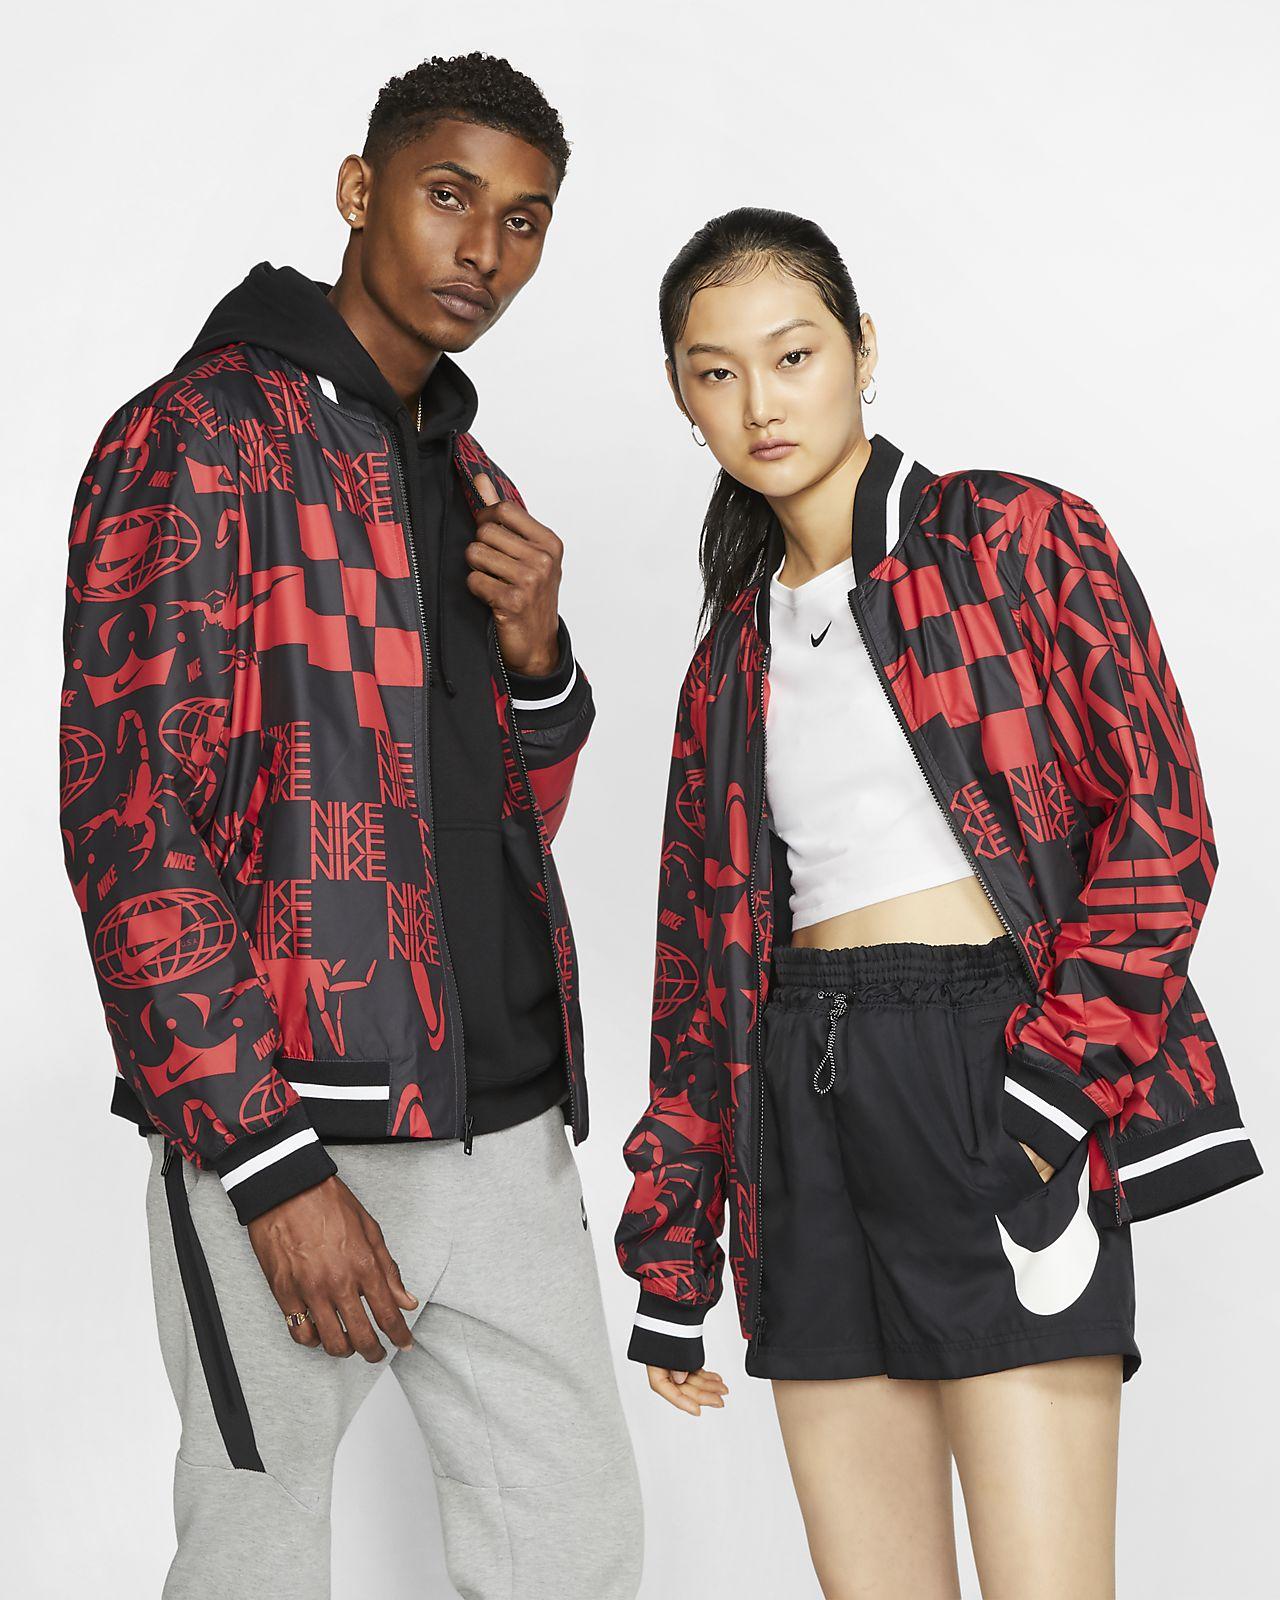 Bunda Nike Sportswear s potiskem